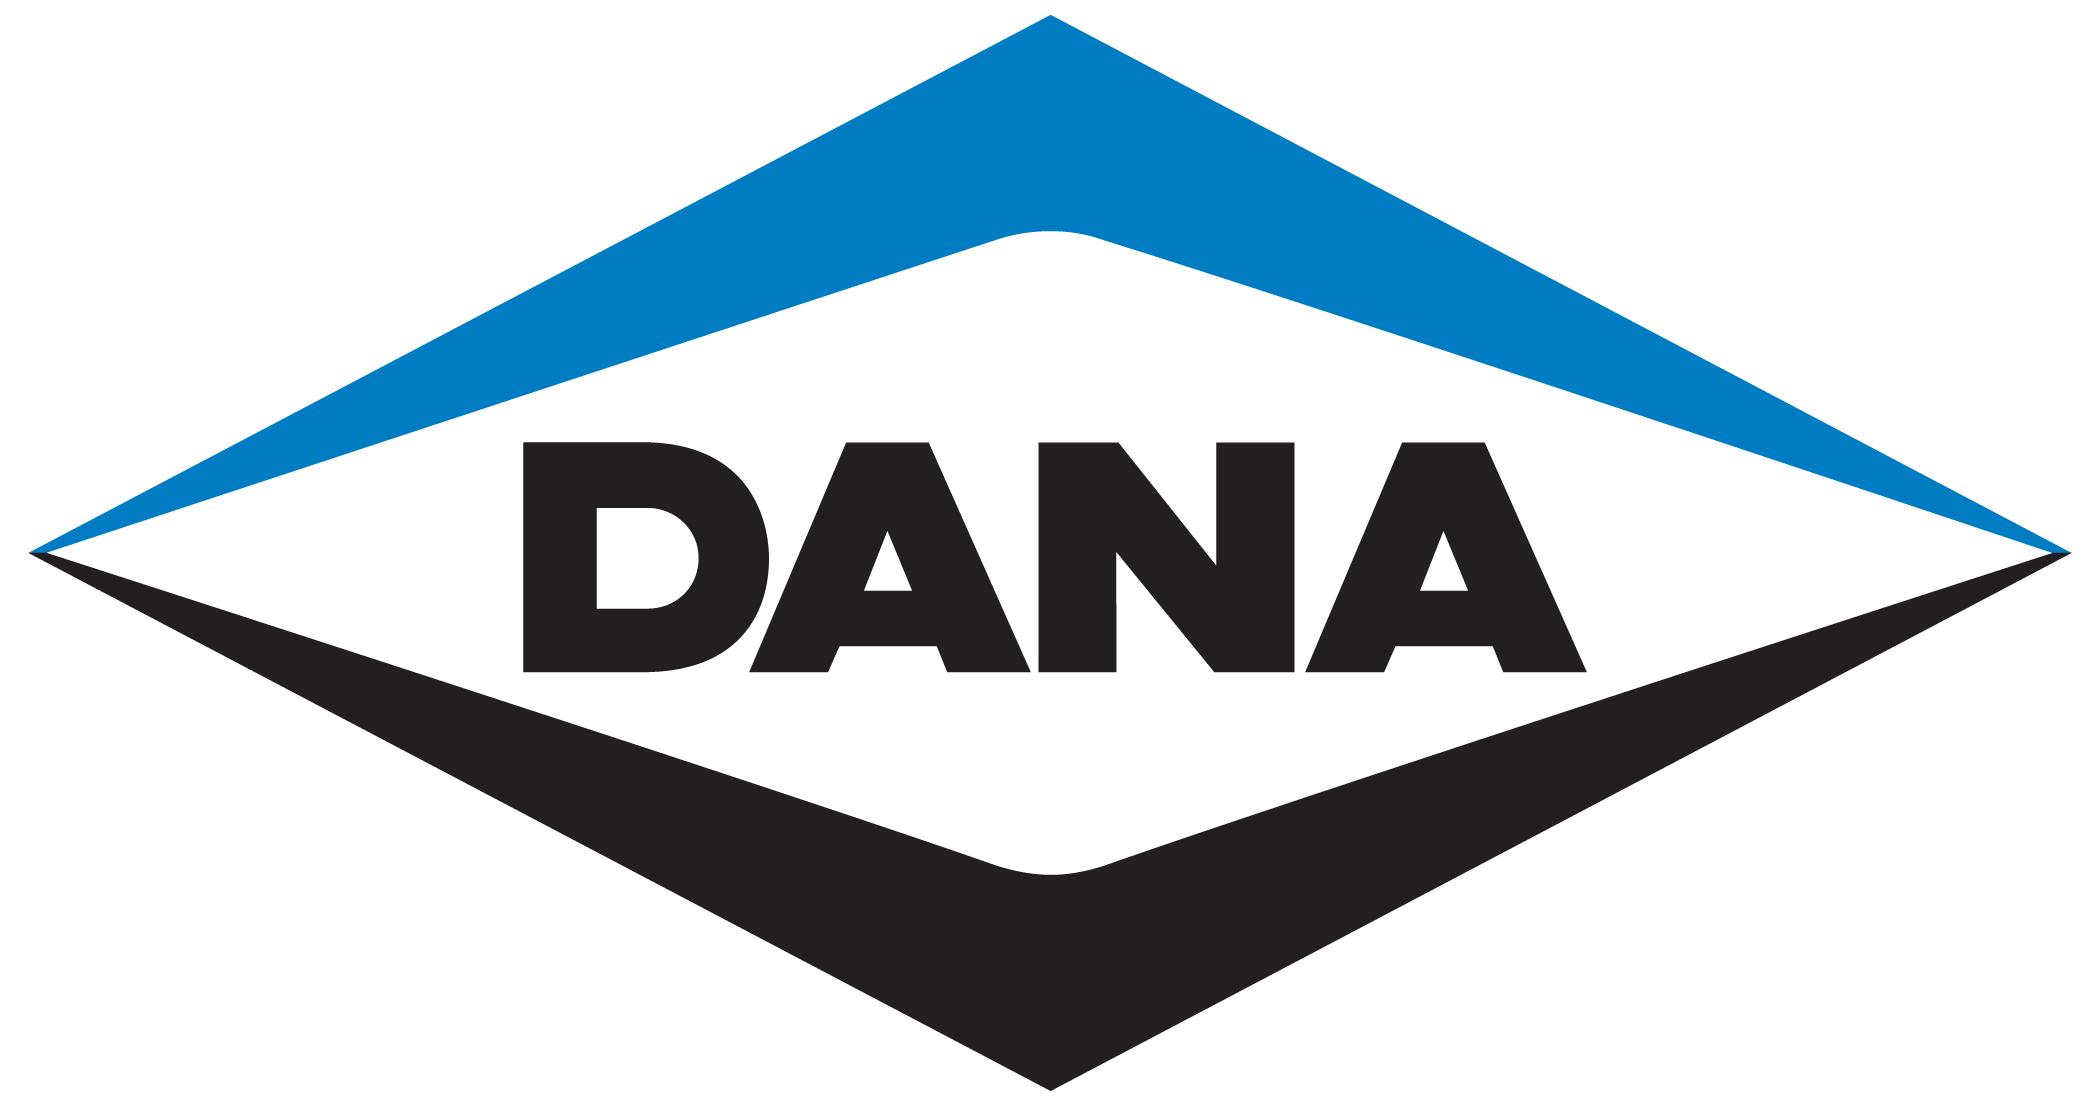 6. Dana Logo - ADiam_lg